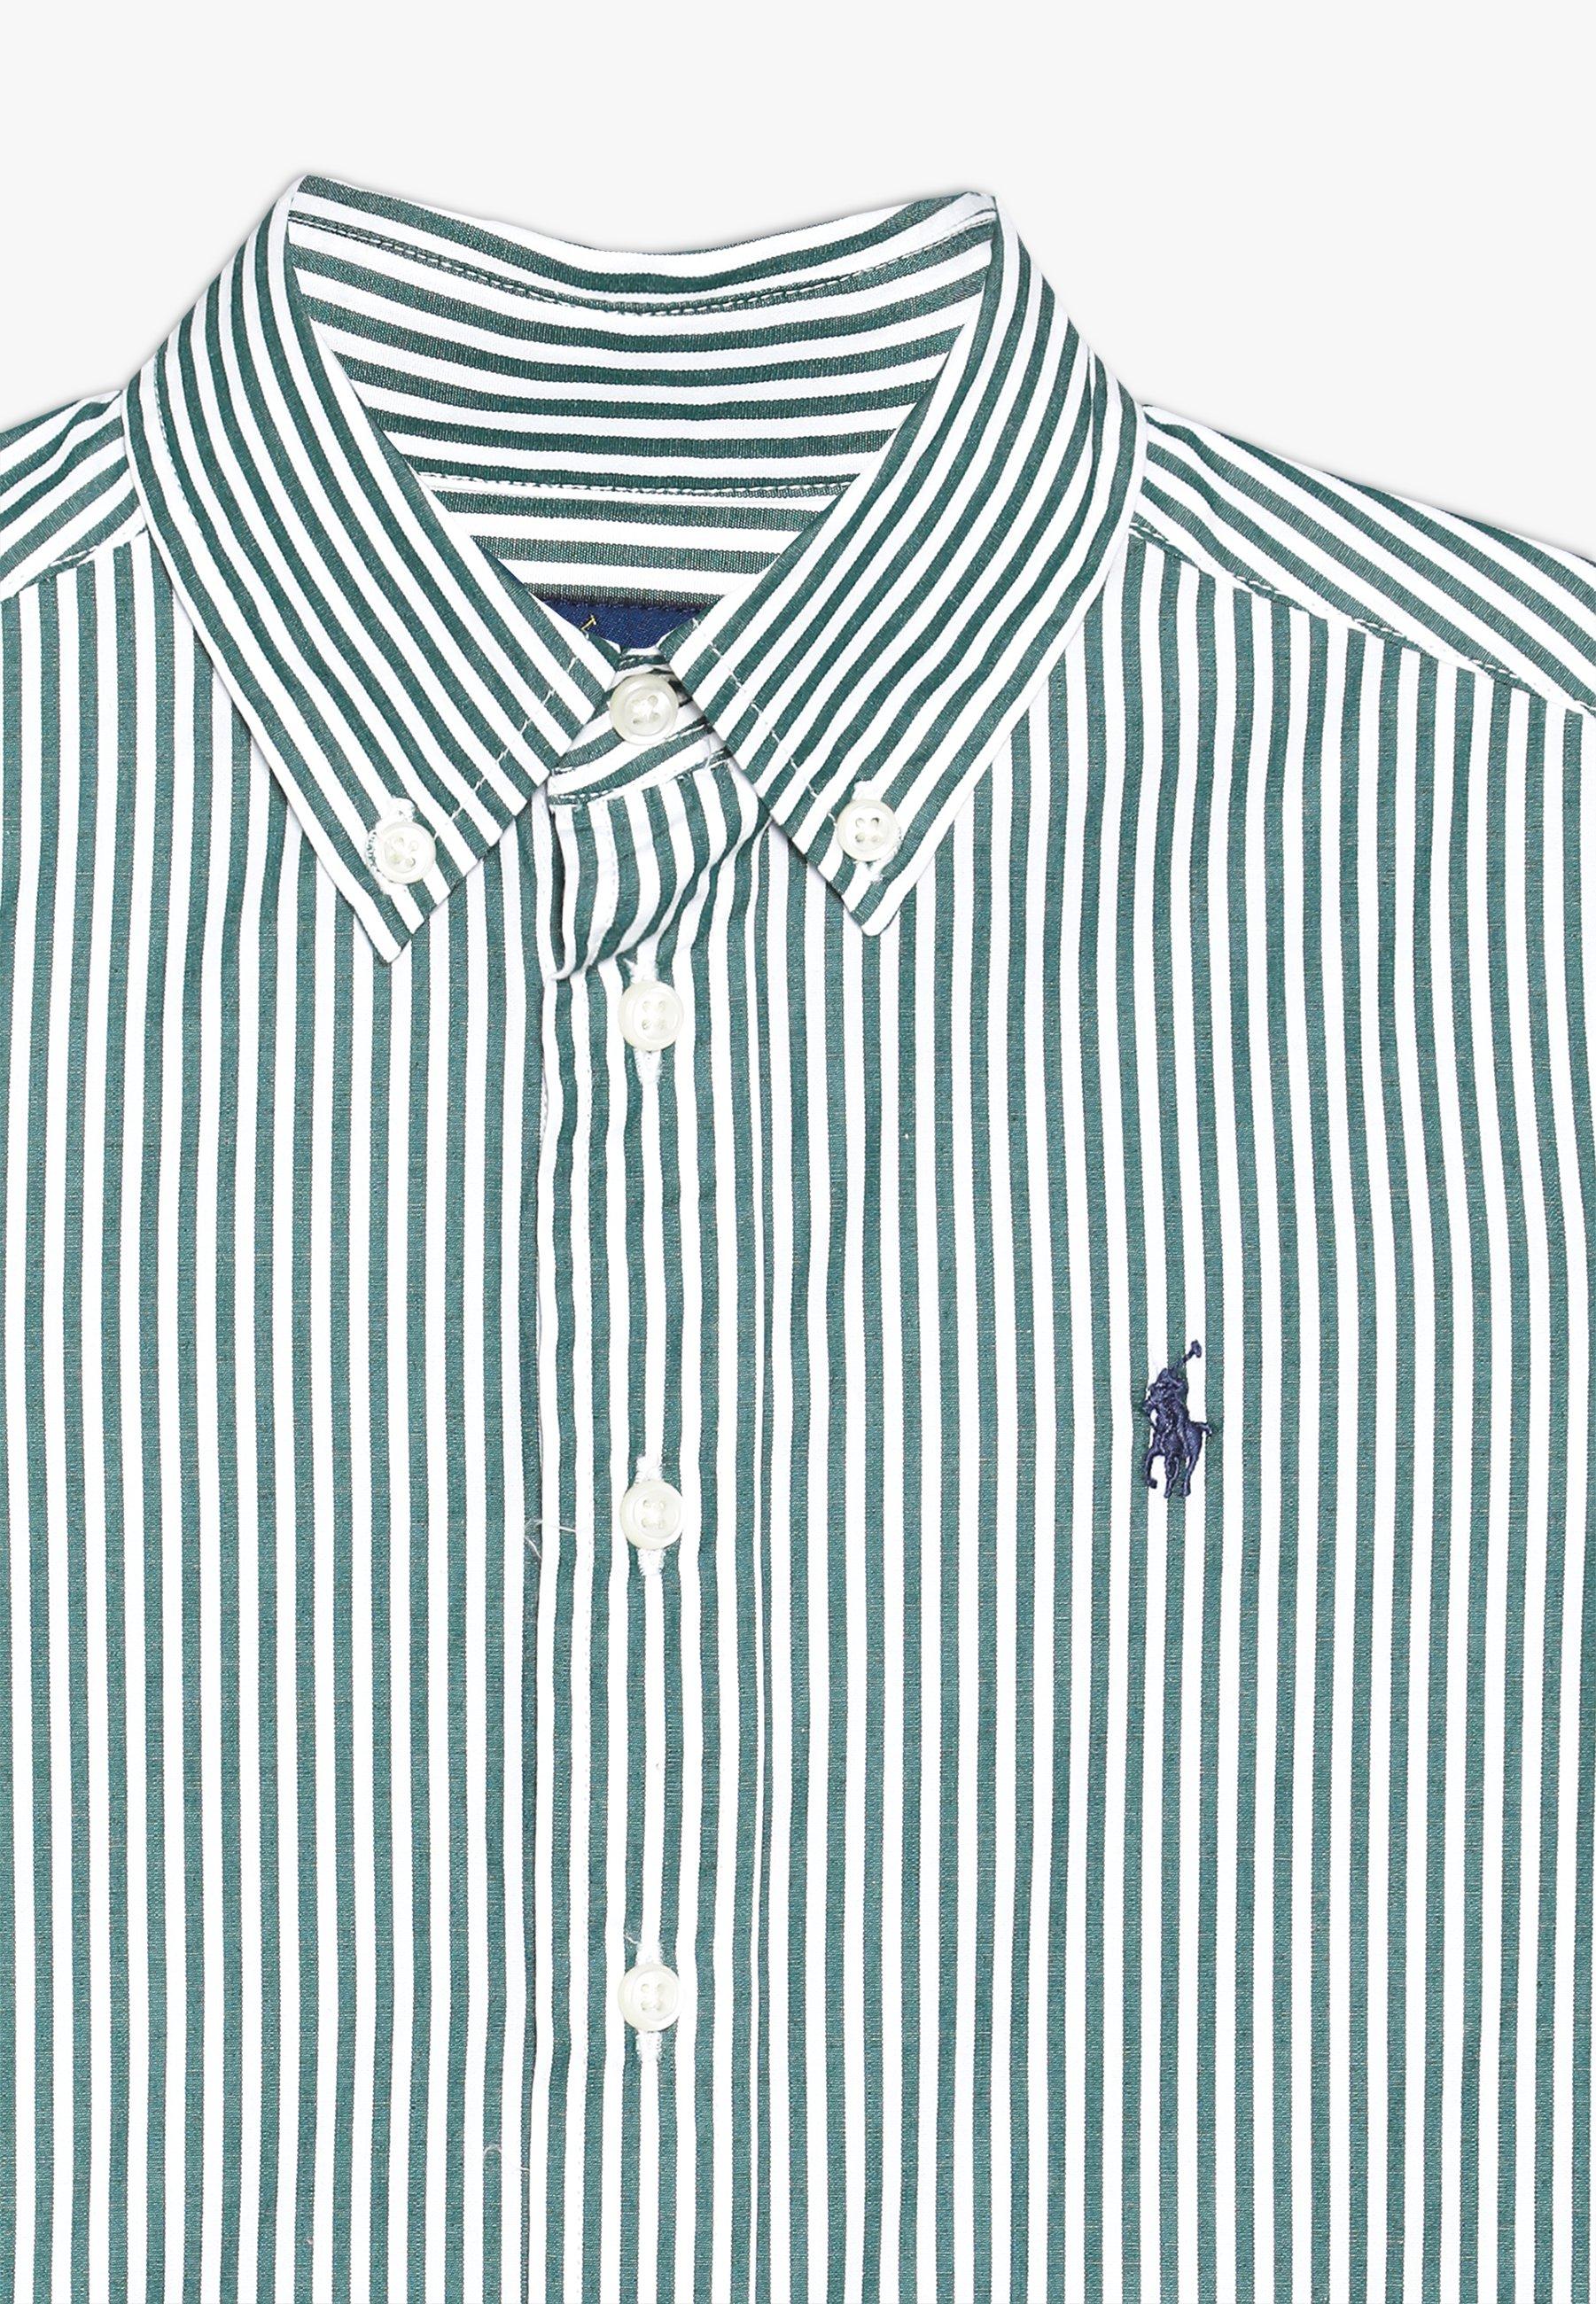 2013 Wholesale Polo Ralph Lauren Shirt - green/white | kids's clothing 2020 5bBpy